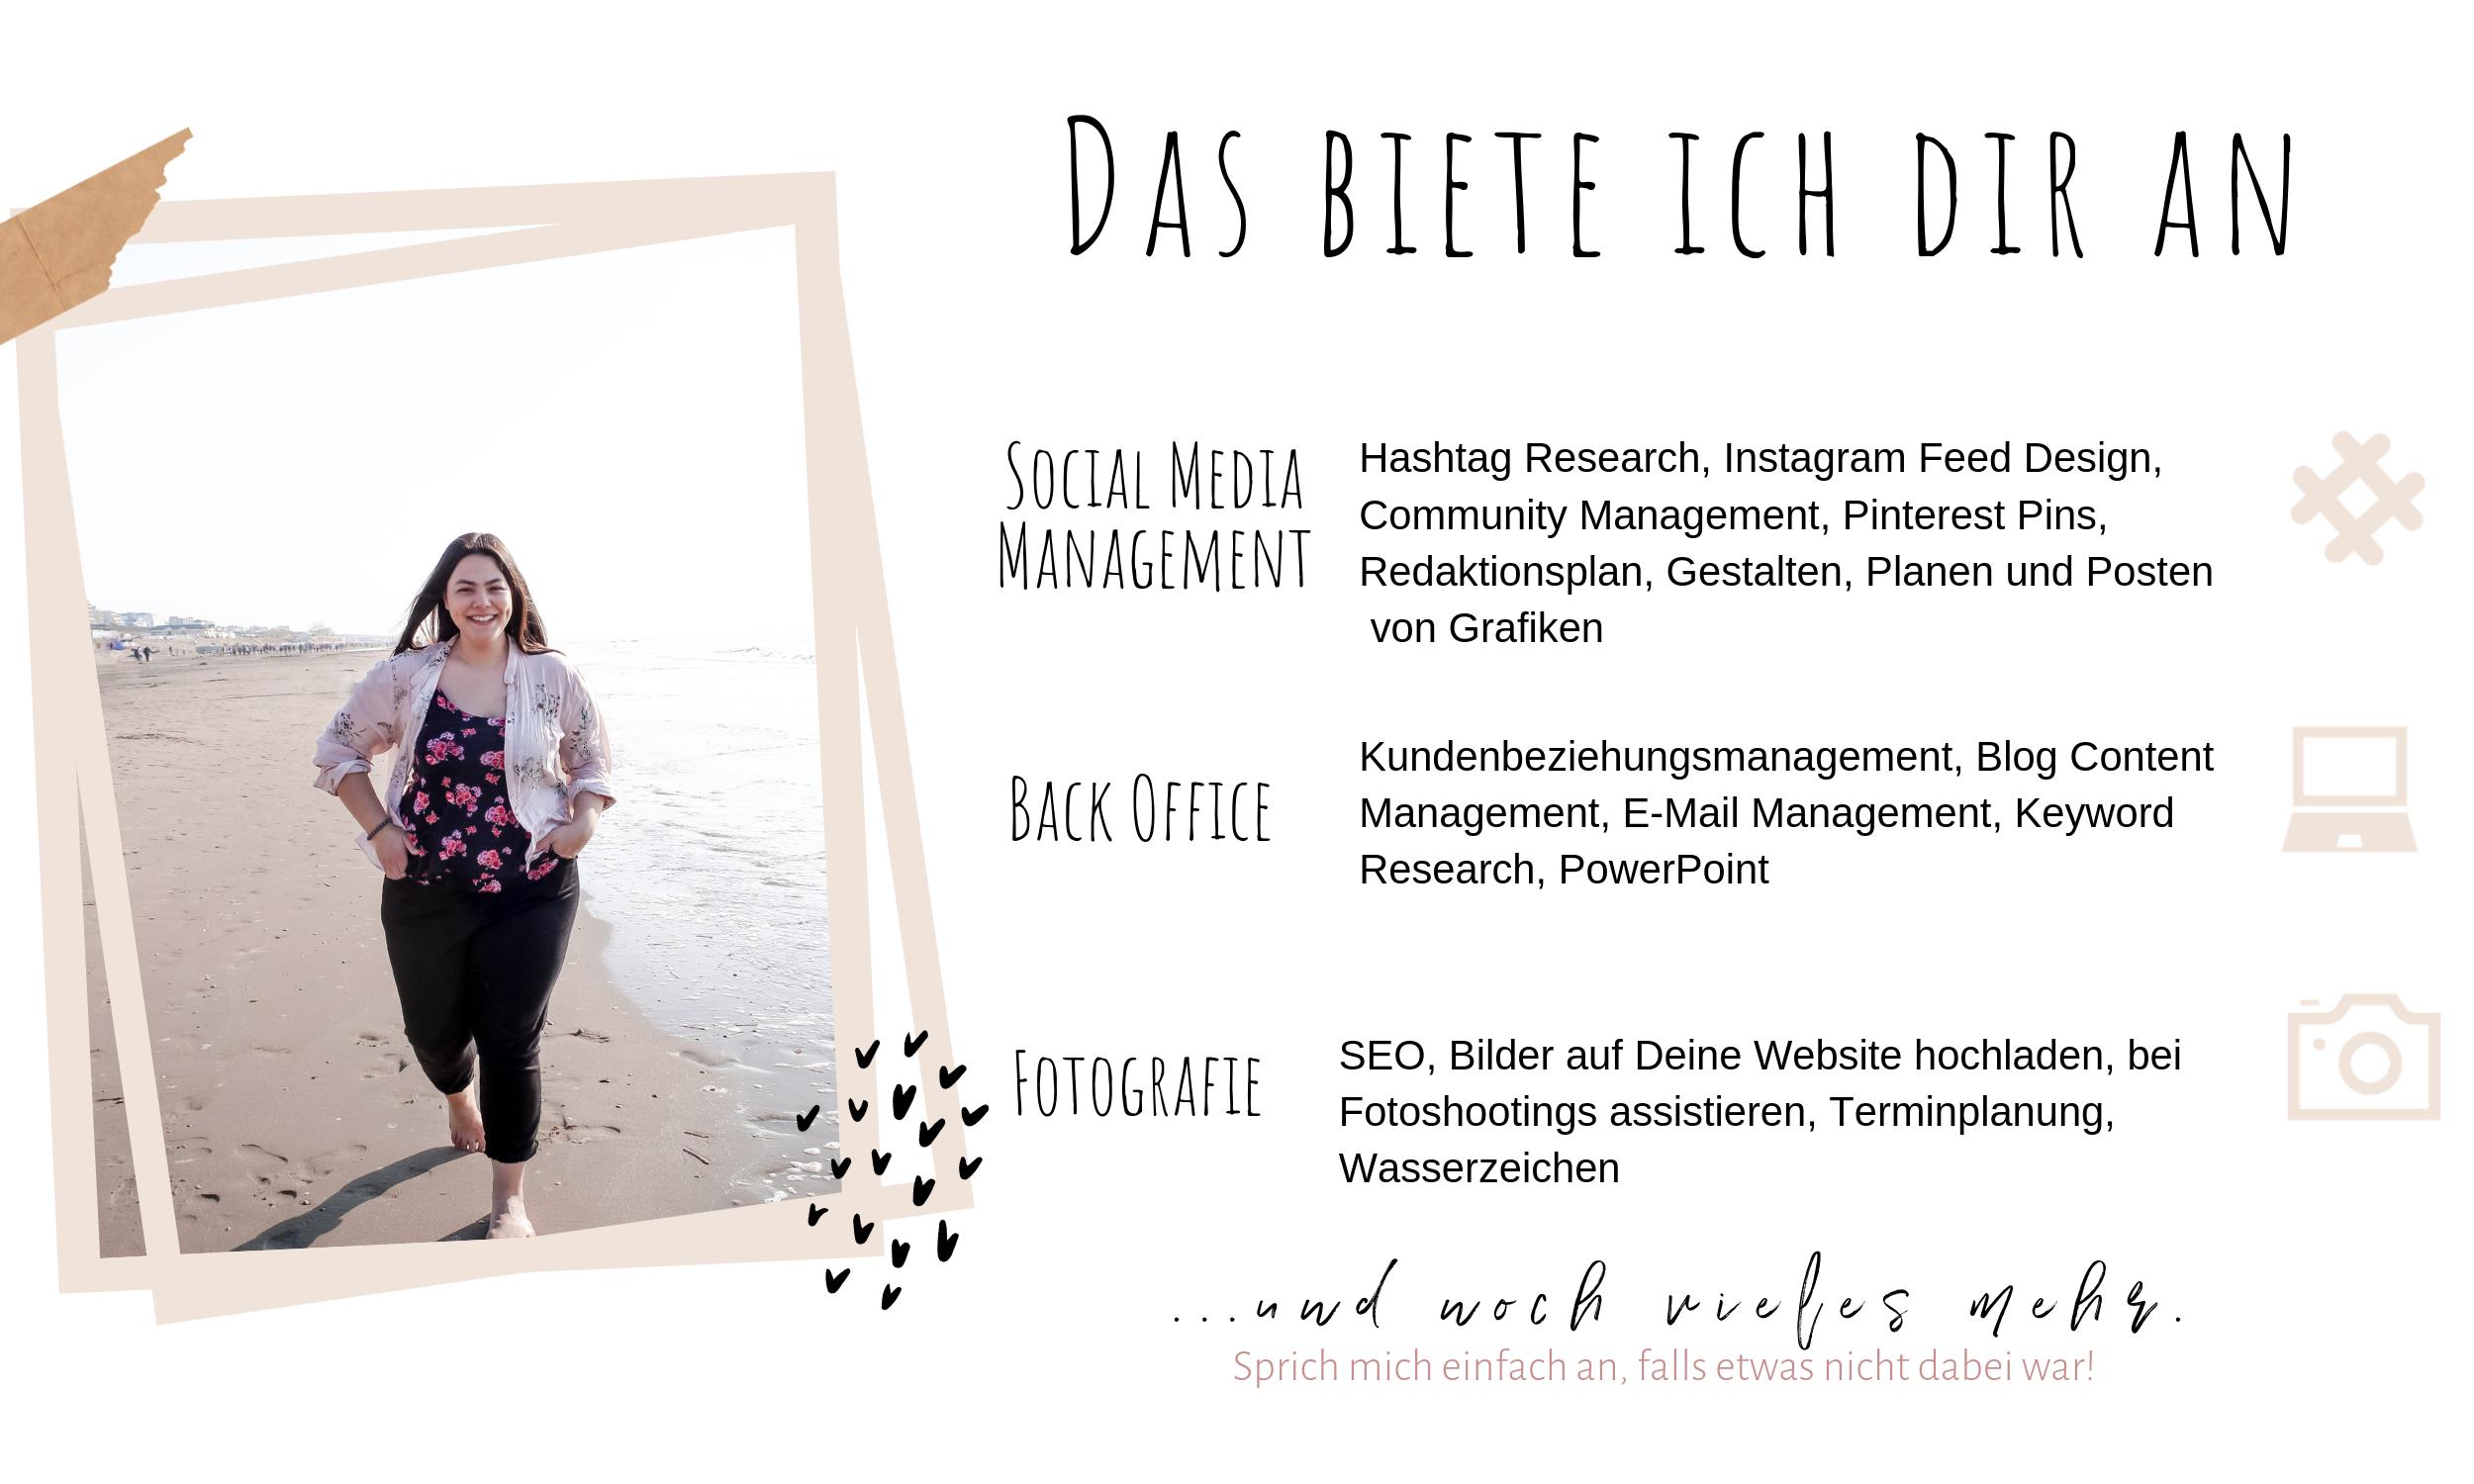 social media management - back office -fotografie - virtuelle assistentin - herprettybravesoul.png